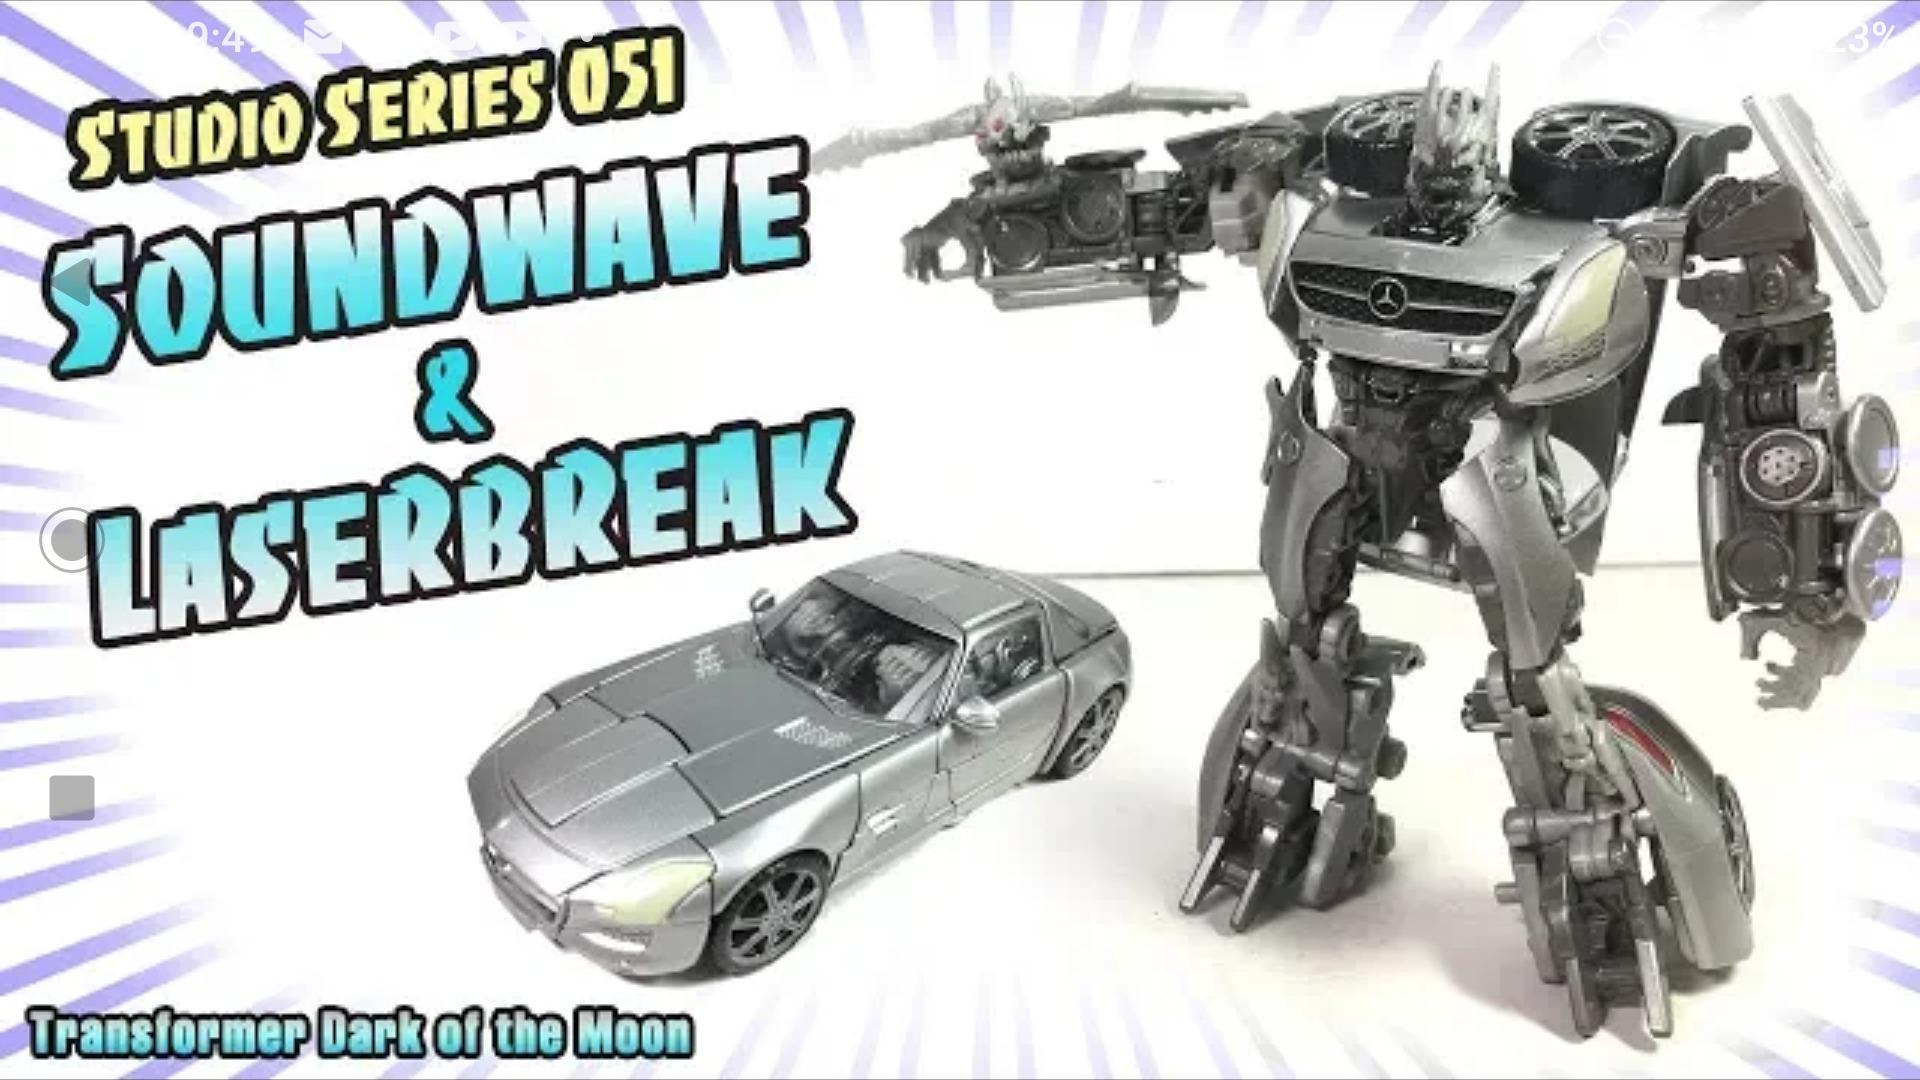 Transformers Studio Series #51 Soundwave DLX Class NEW SEALED